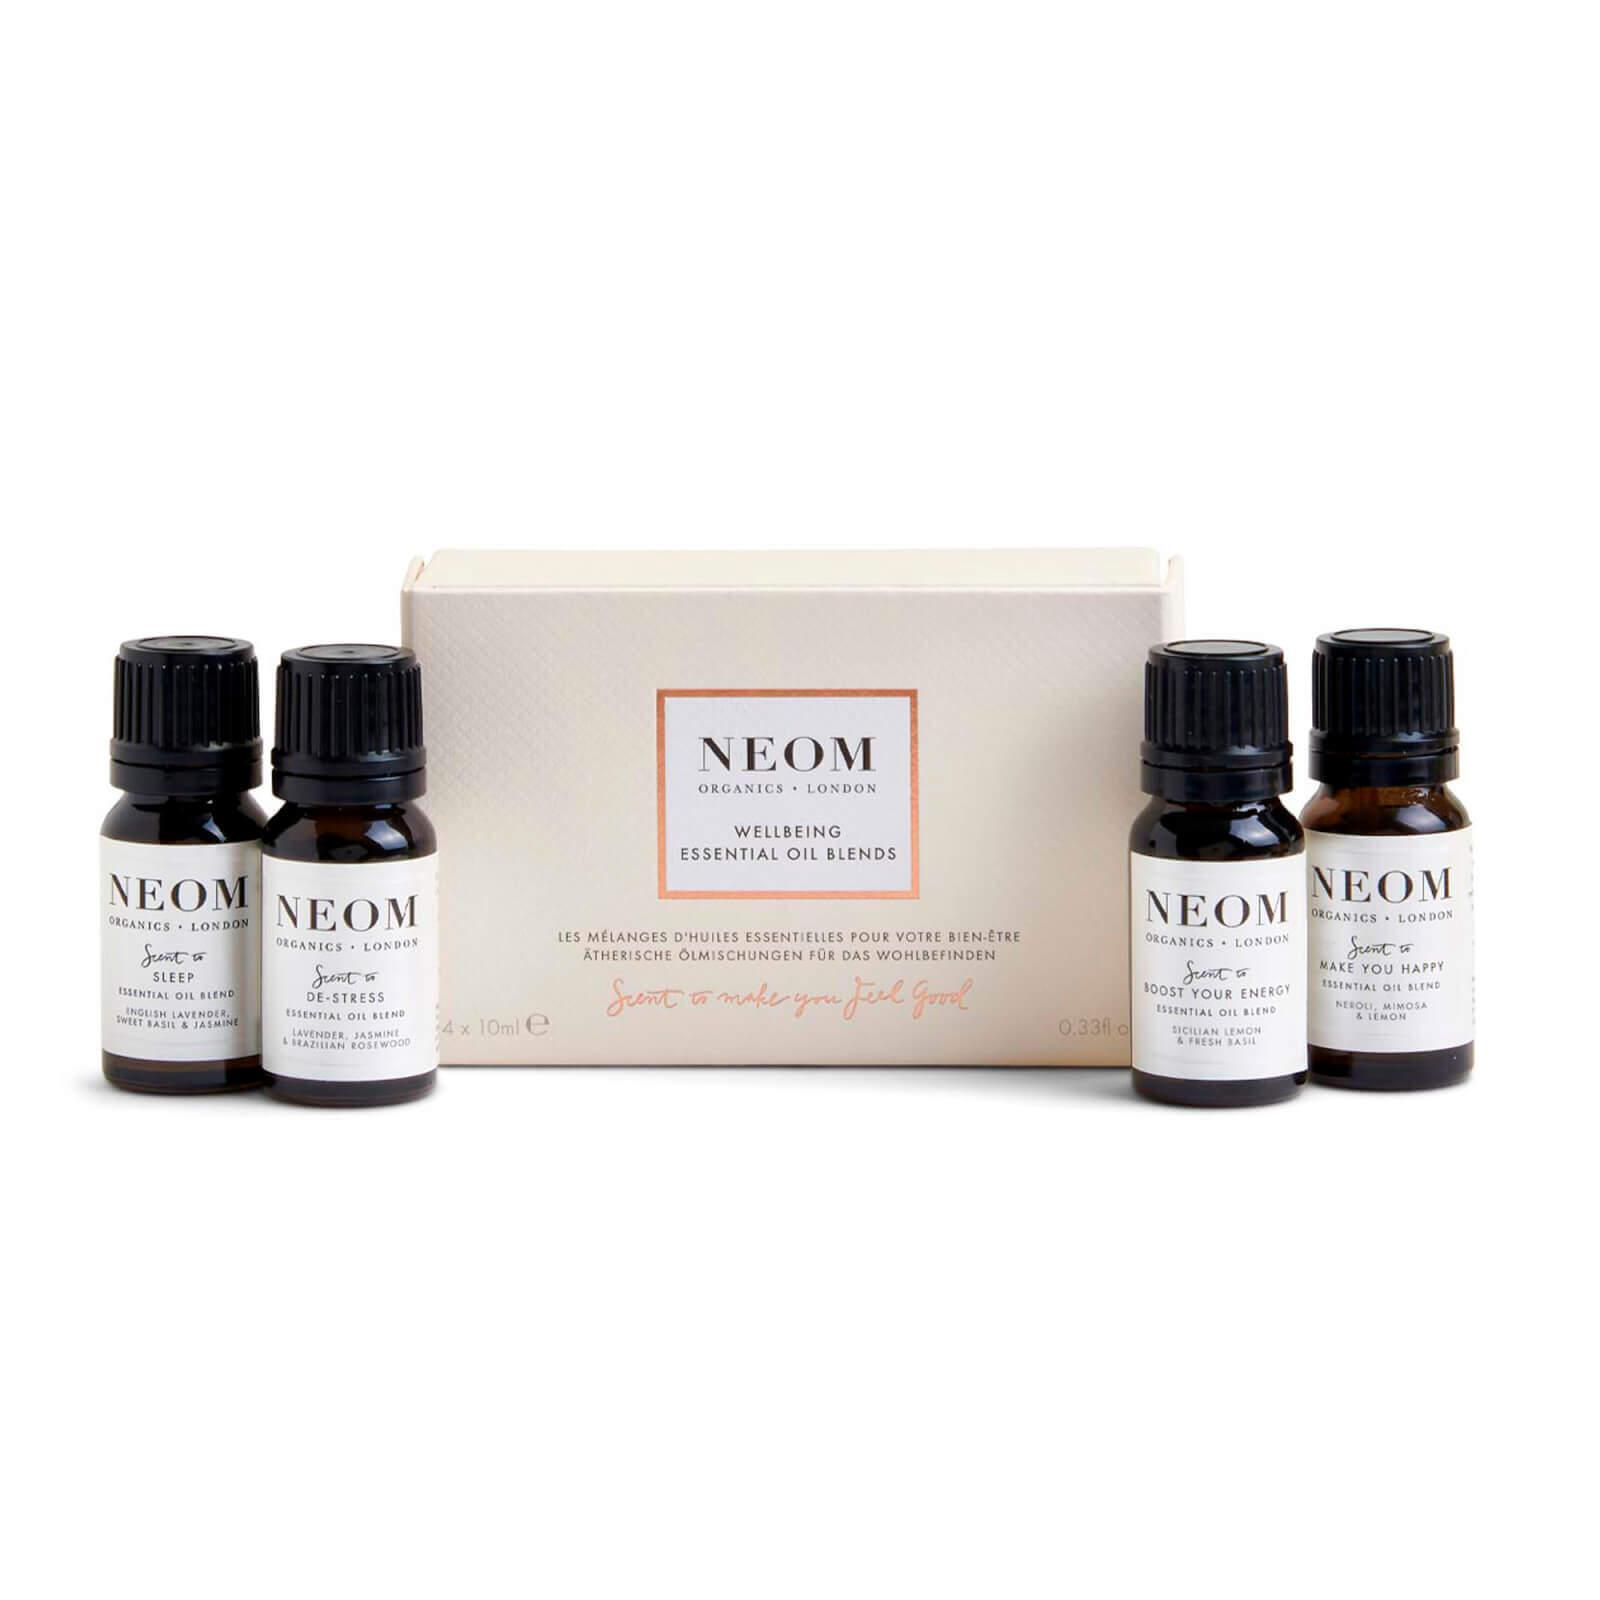 NEOM Essential Oil Blends 4